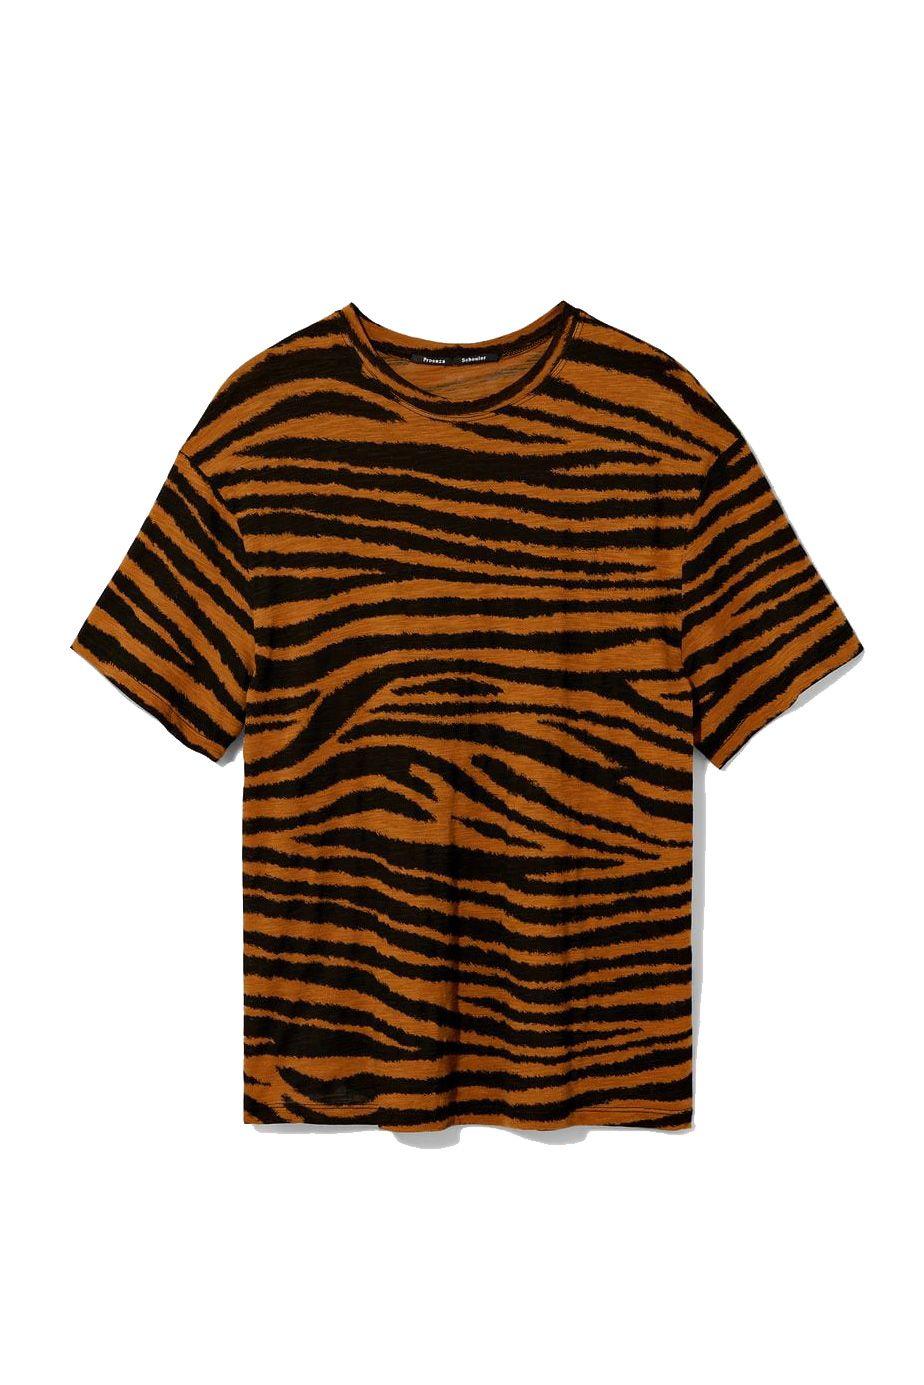 89ec1e143da Tiger Print Trend - Shop Tiger Stripe Print